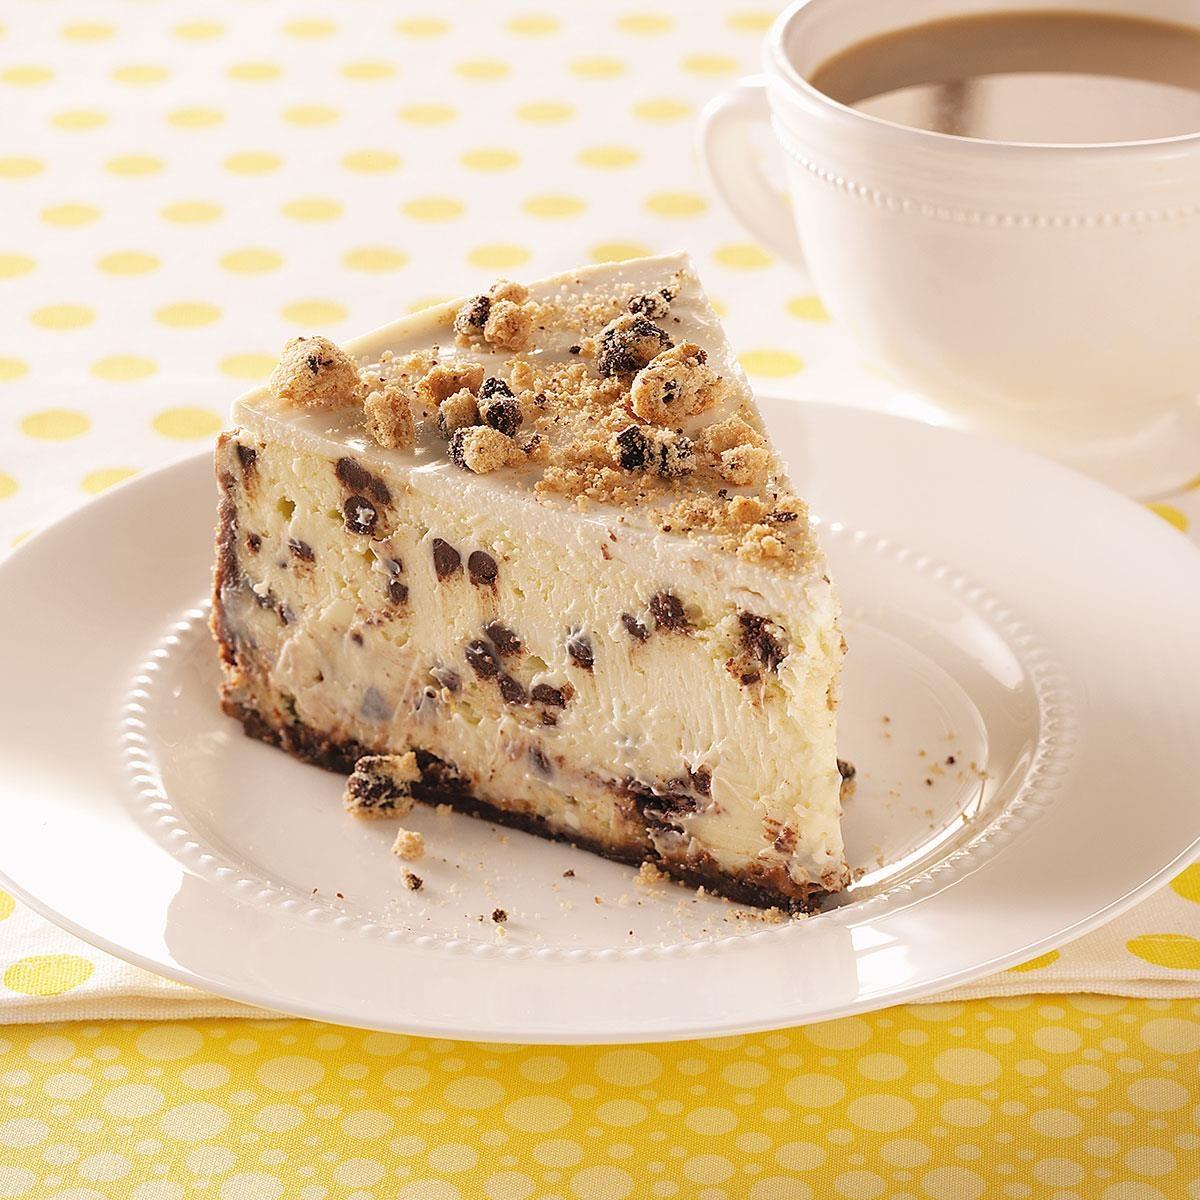 Chocolate Chip Cheesecake Taste Of Home